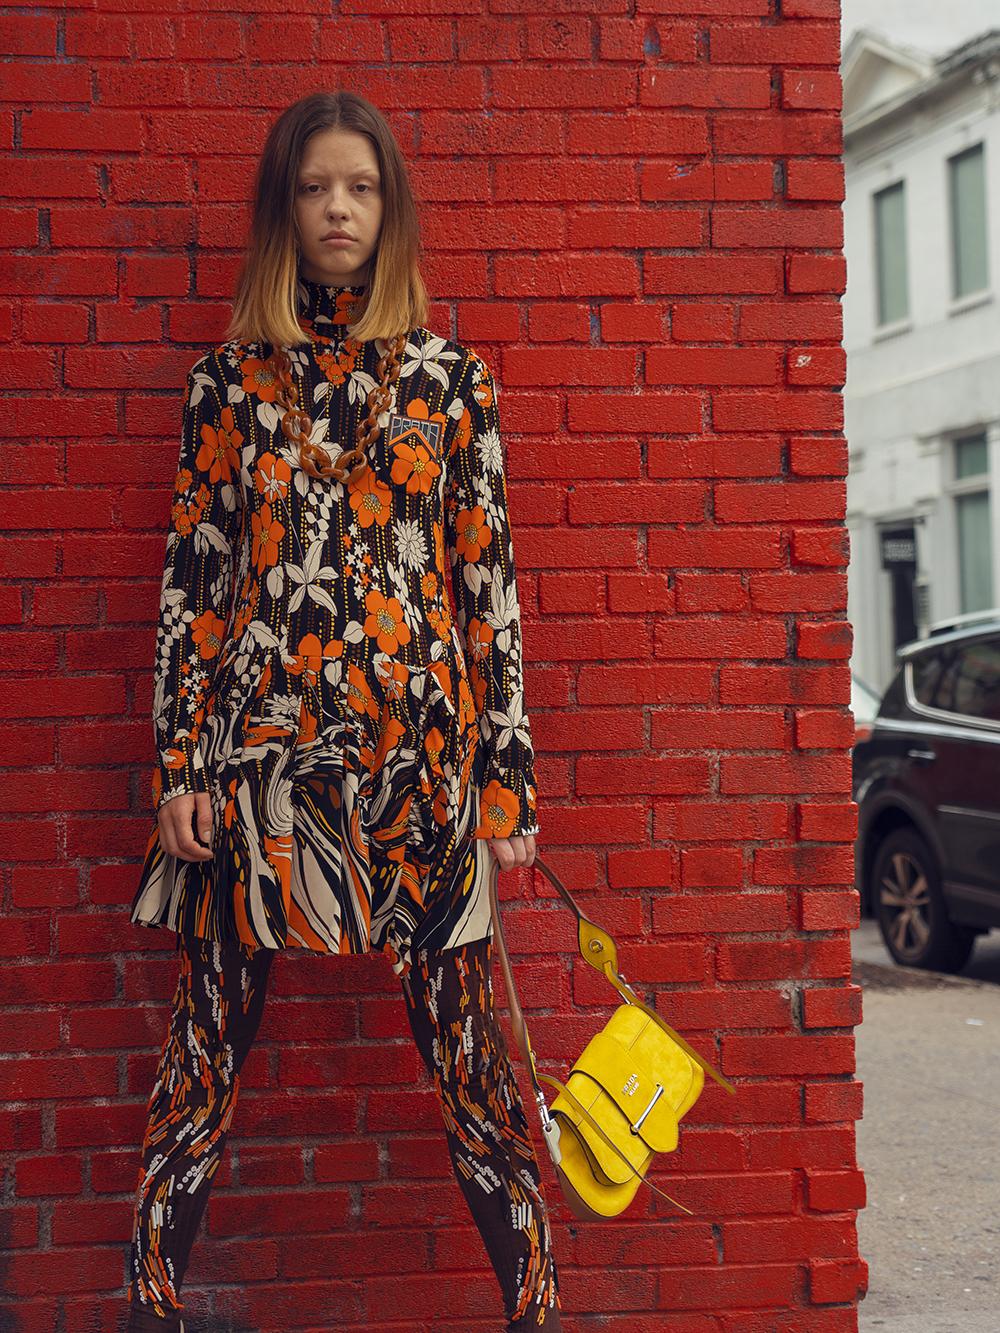 Mia Goth in Prada Dress - Crash Magazine interview